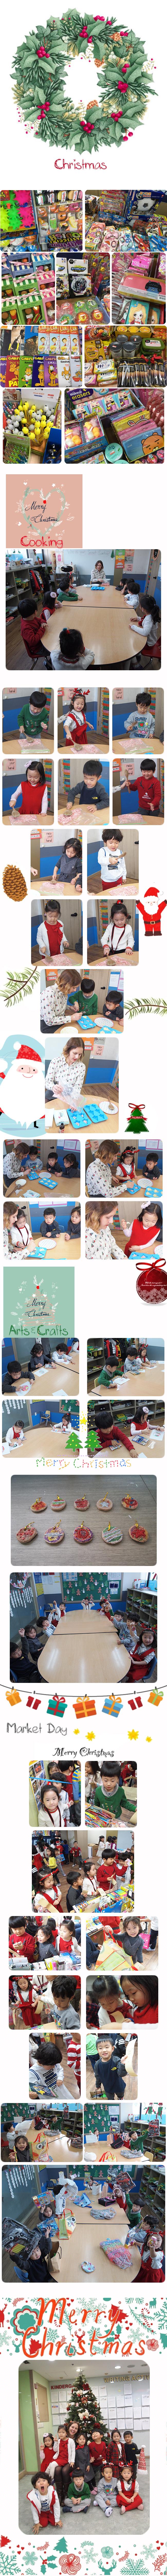 2017 Christmas_1222.jpg